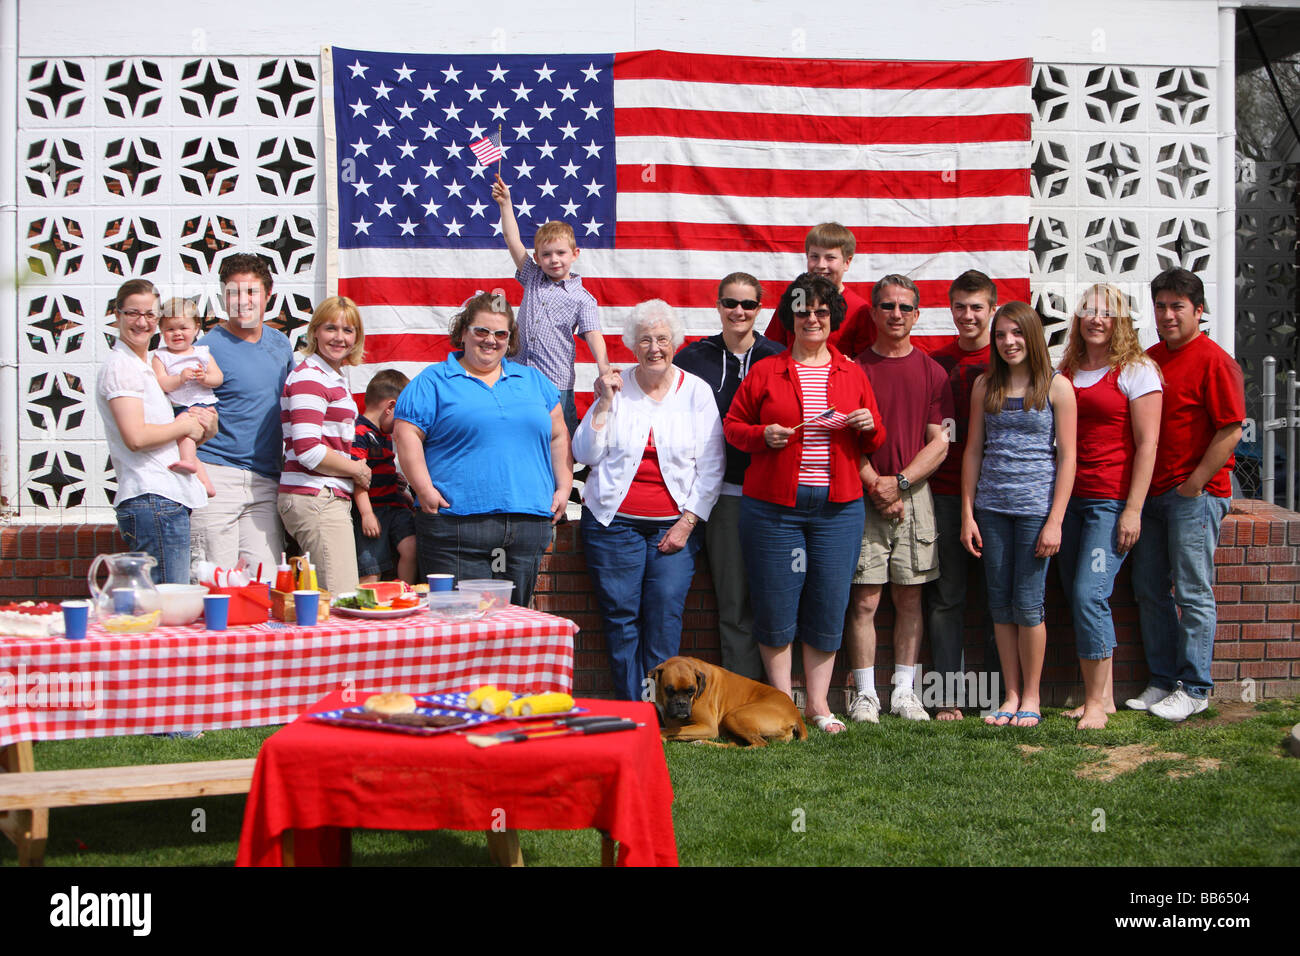 Grande famille portrait de groupe au 4 juillet Barbecue Photo Stock